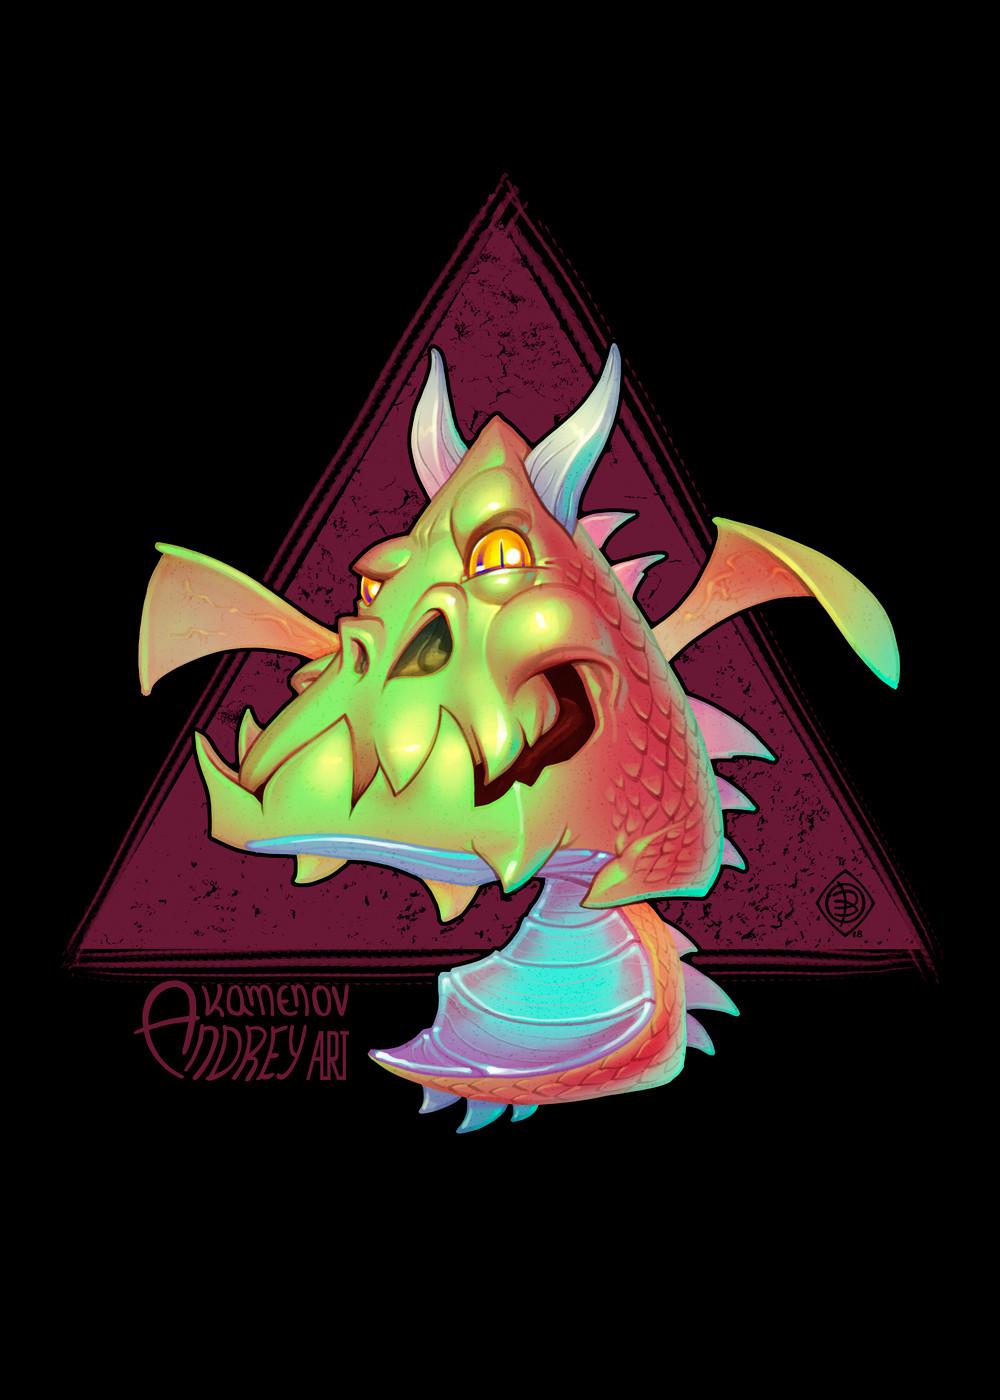 Andrey kamenov dragon triangle 06